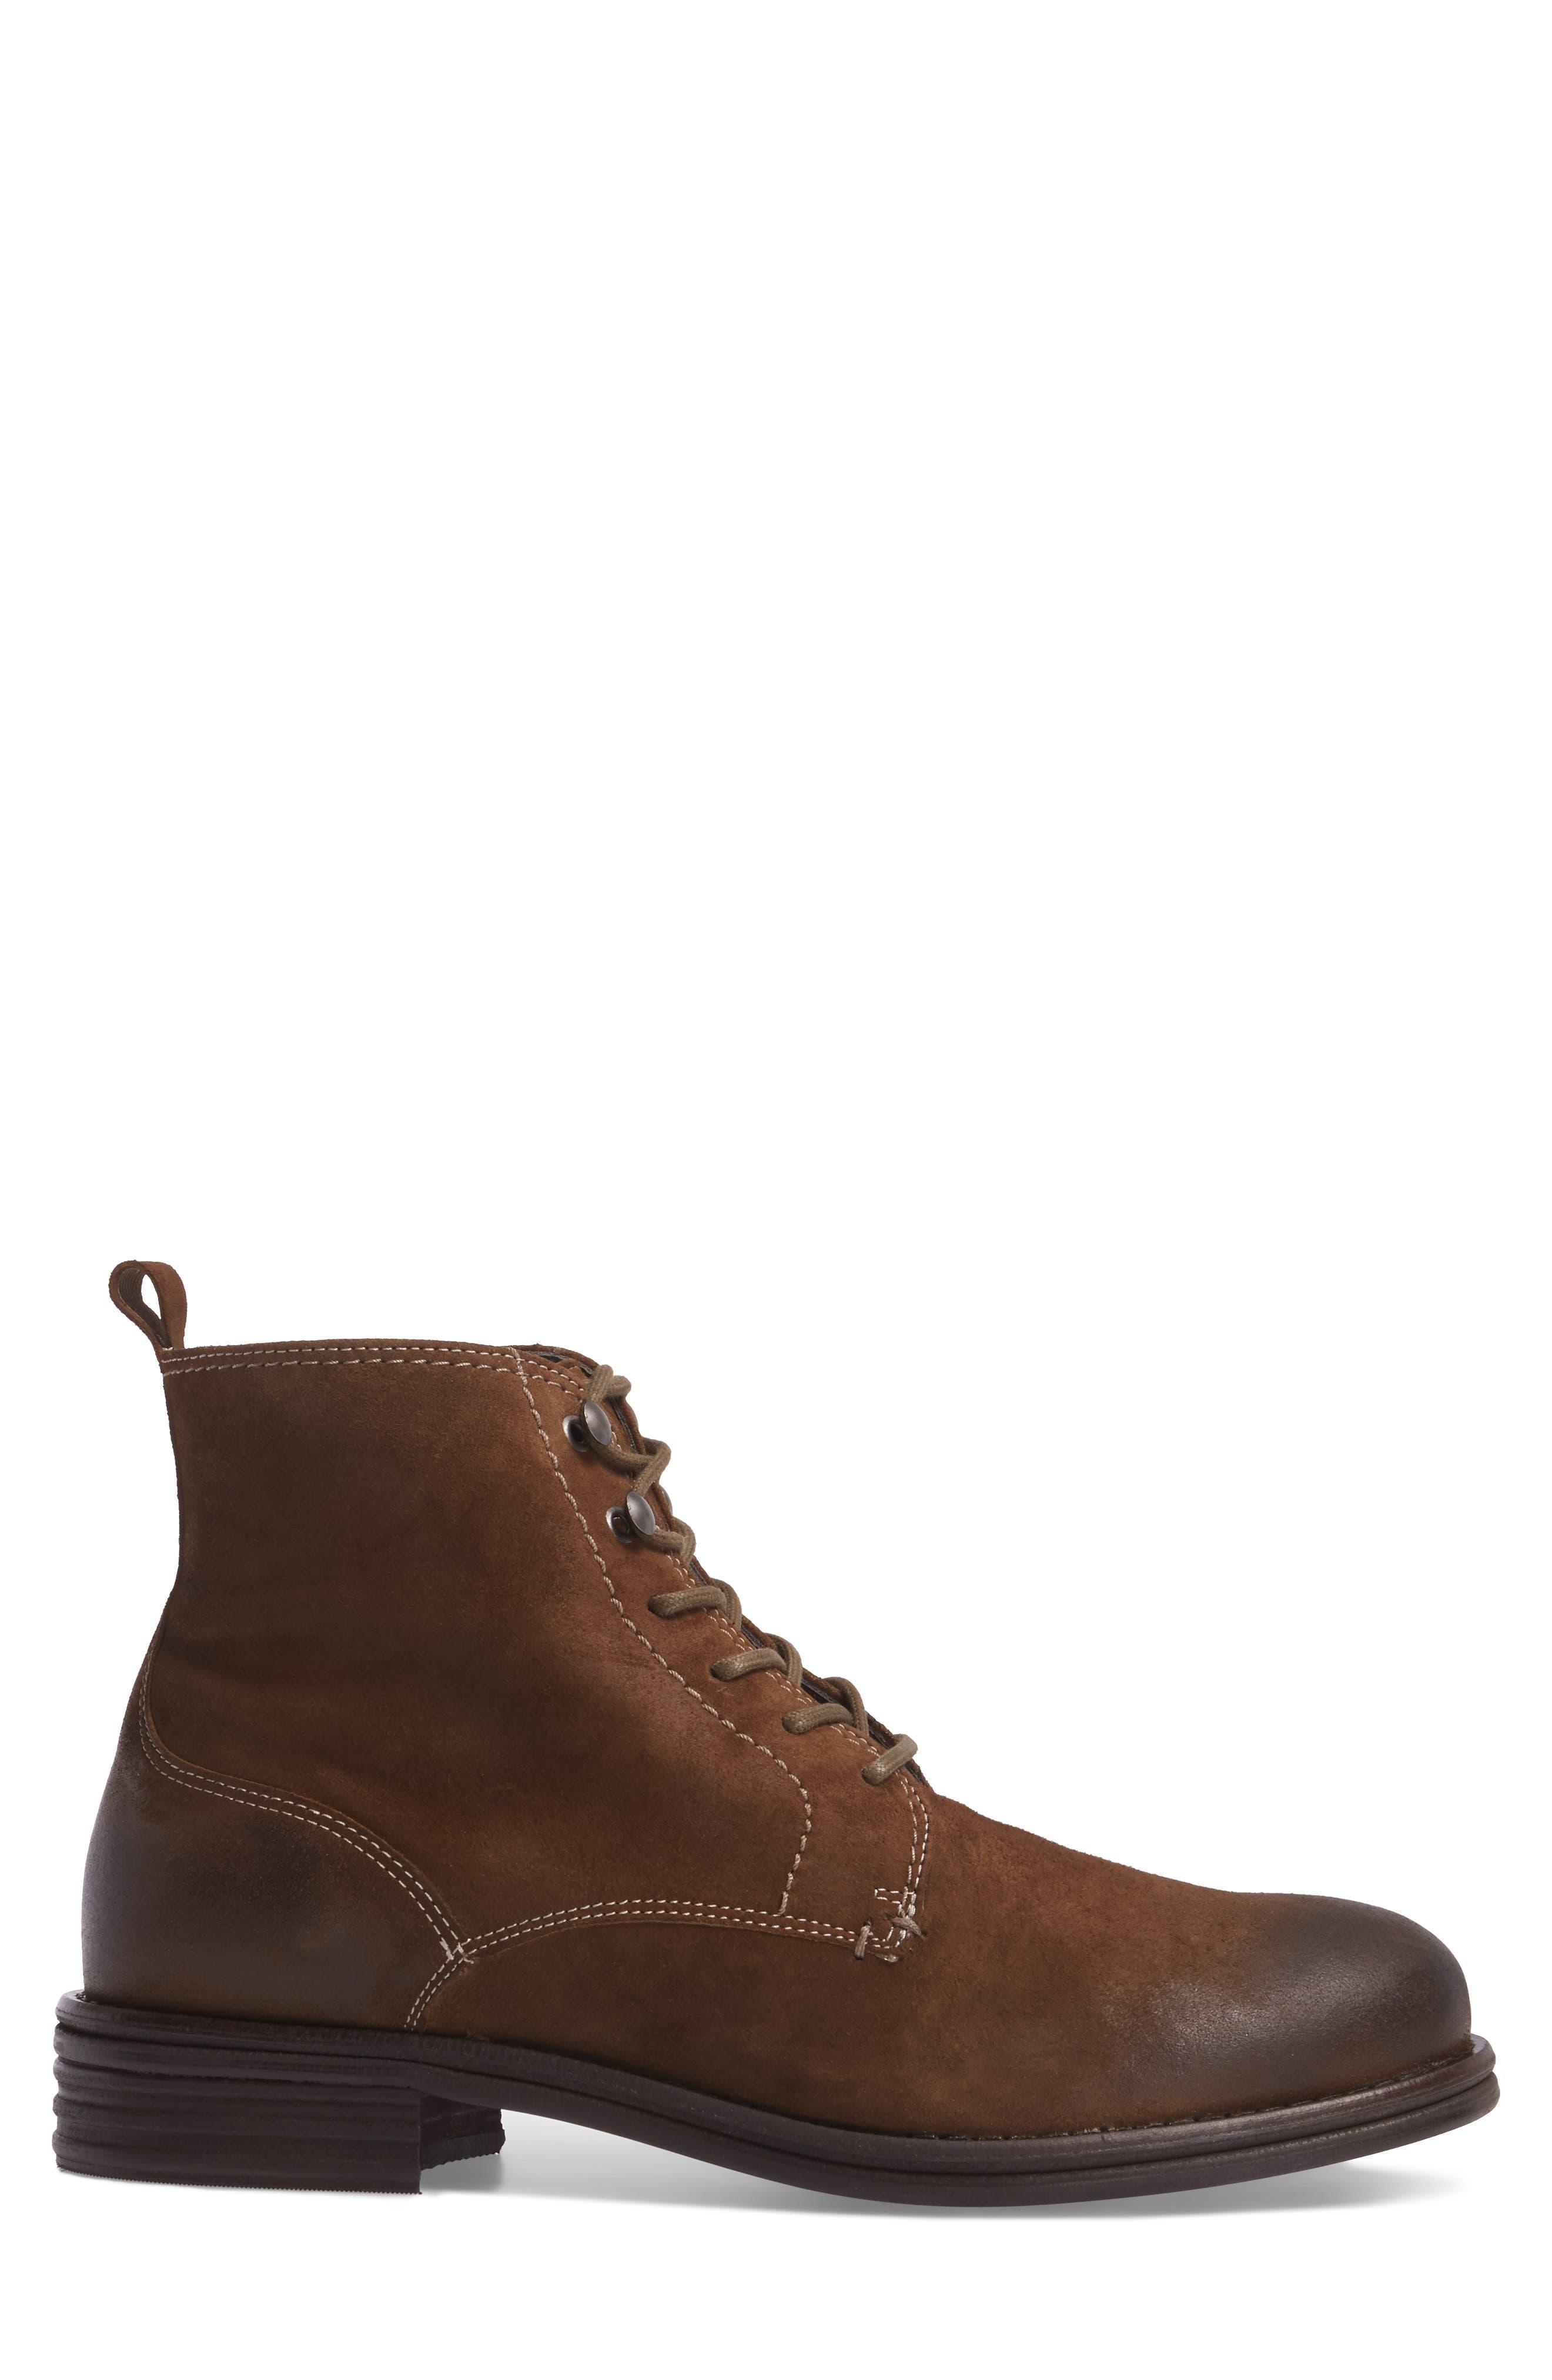 Cordie Plain Toe Boot,                             Alternate thumbnail 3, color,                             Oliva Suede